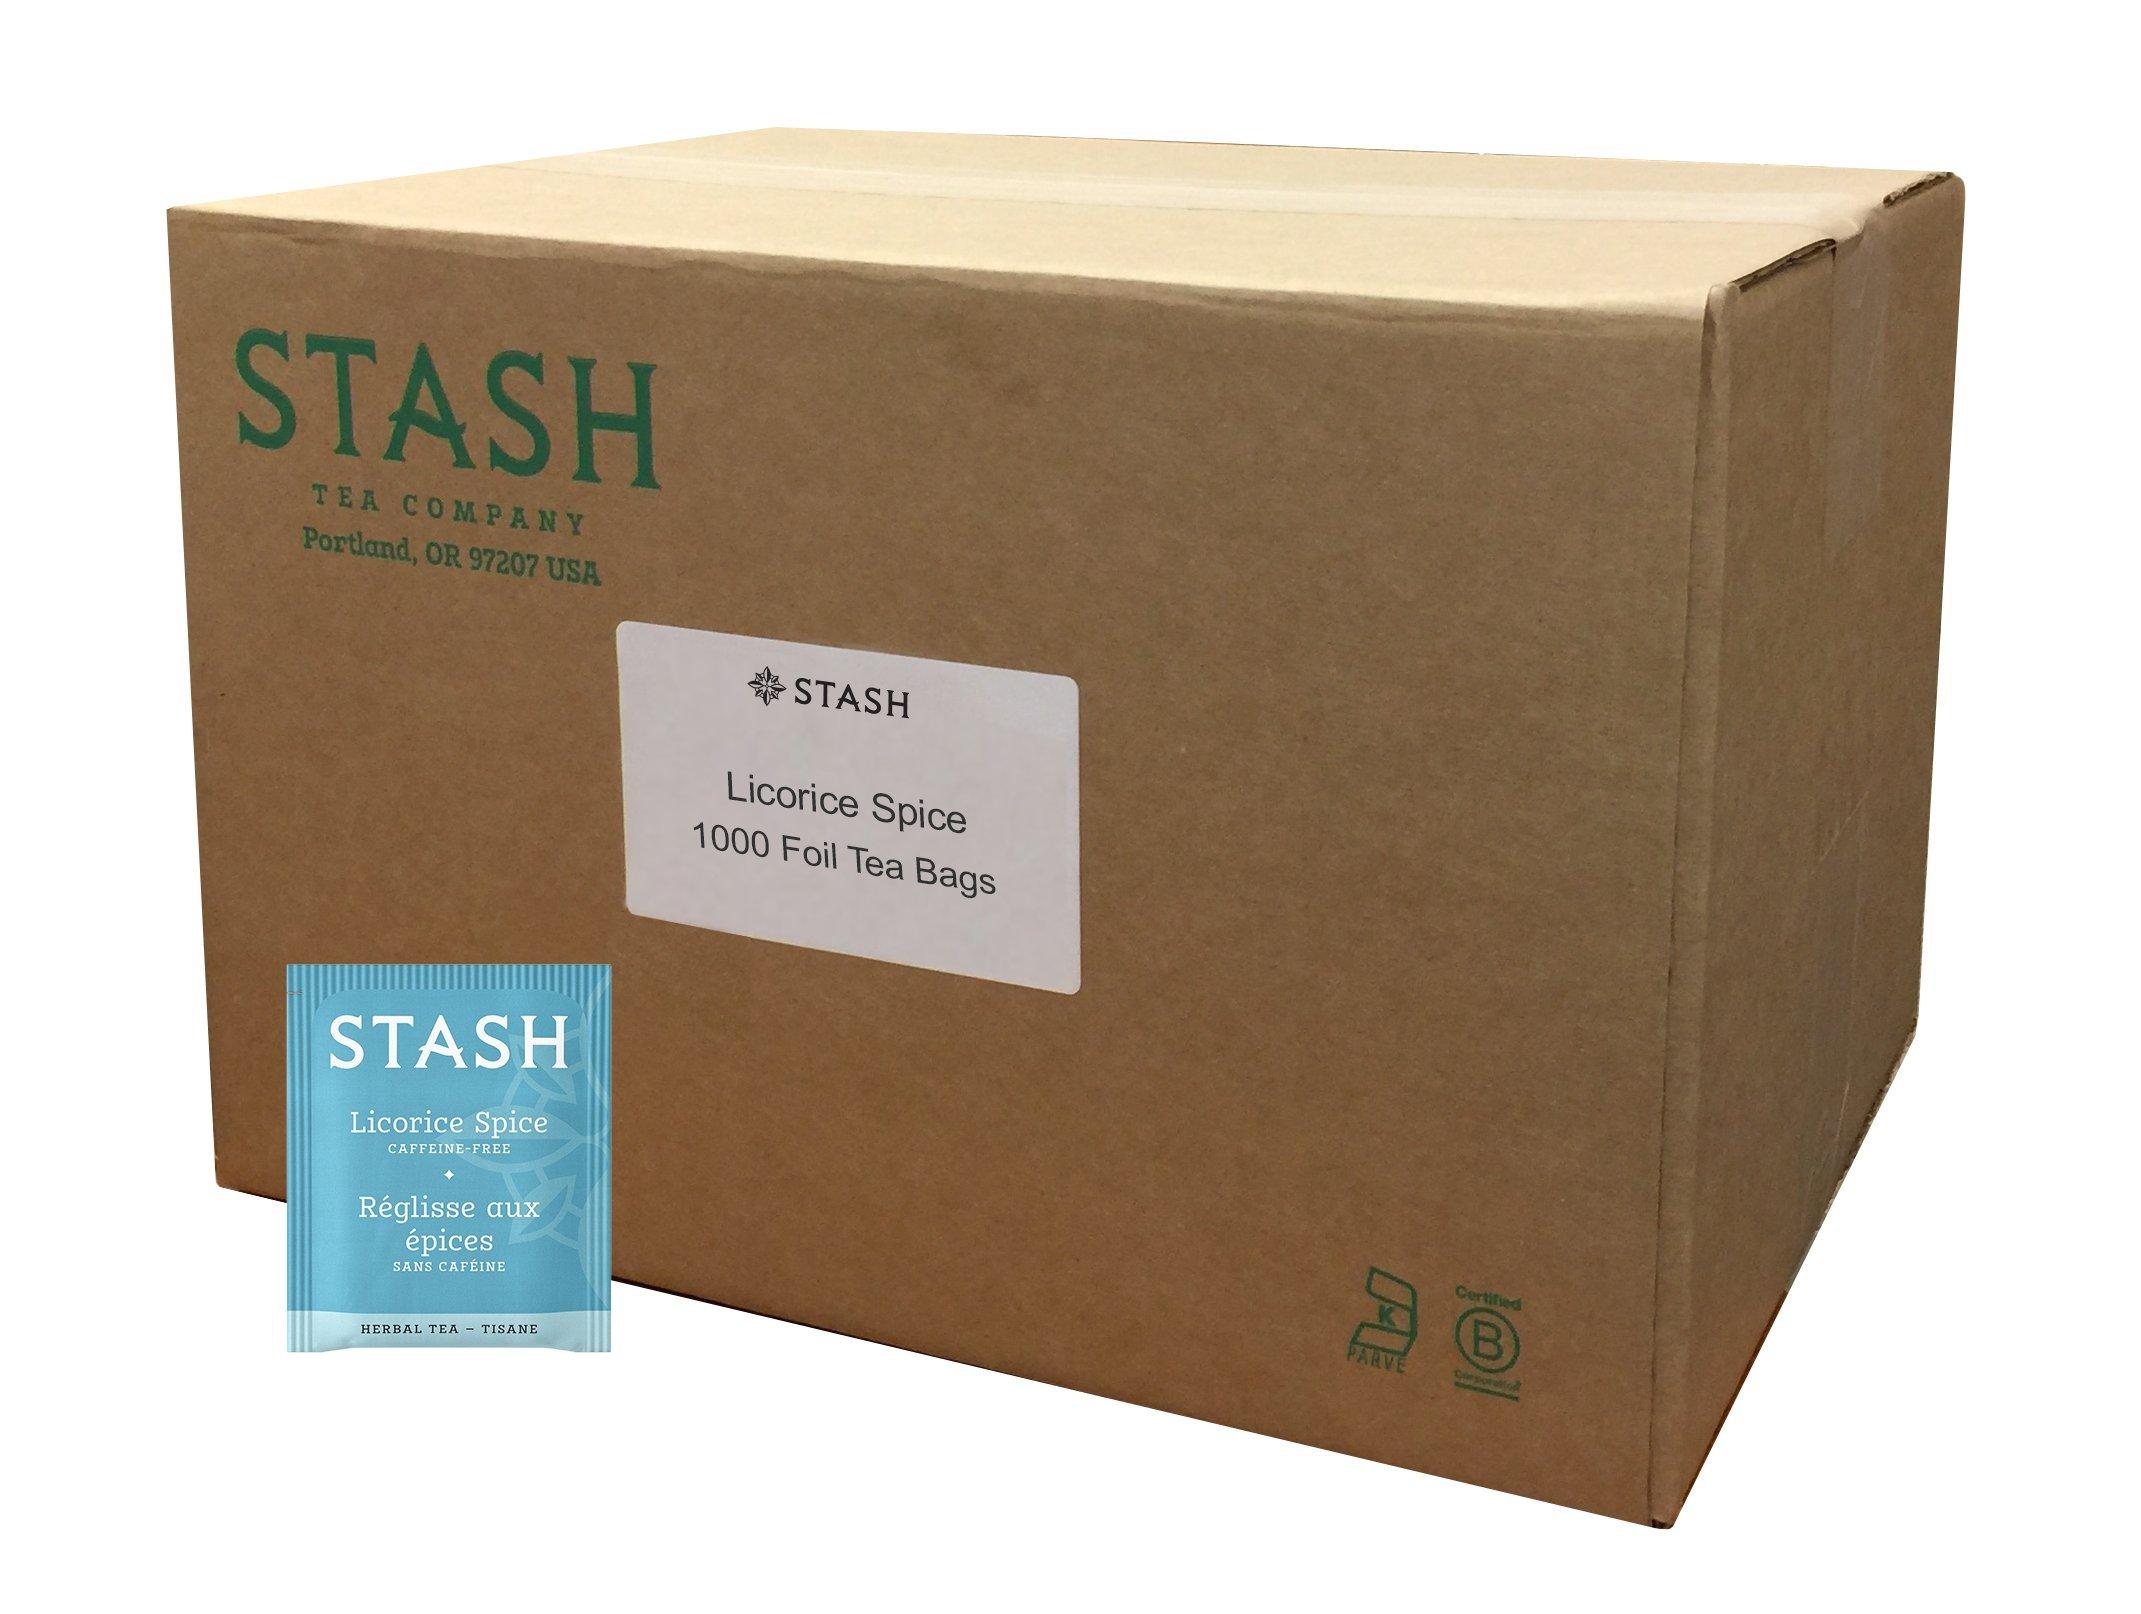 Stash Tea Licorice Spice Herbal Tea 1000 Tea Bags in 8.35 Count Tea Bags in Foil, Naturally Sweet Herbal Tisane, Zero Caffeine, Drink Hot or Iced by Stash Tea